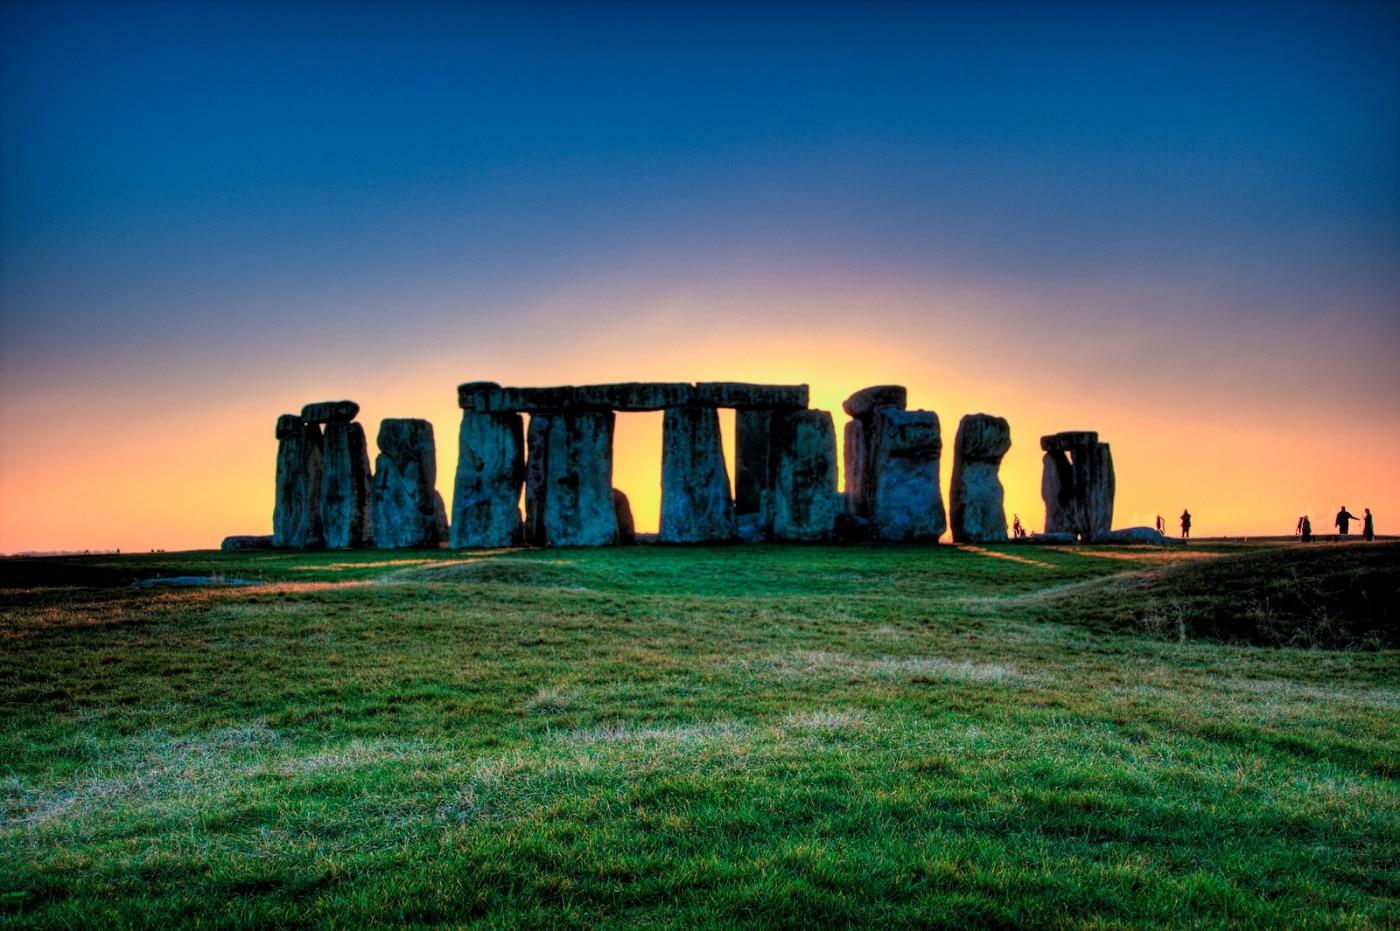 Cel mai important monument preistoric al Angliei